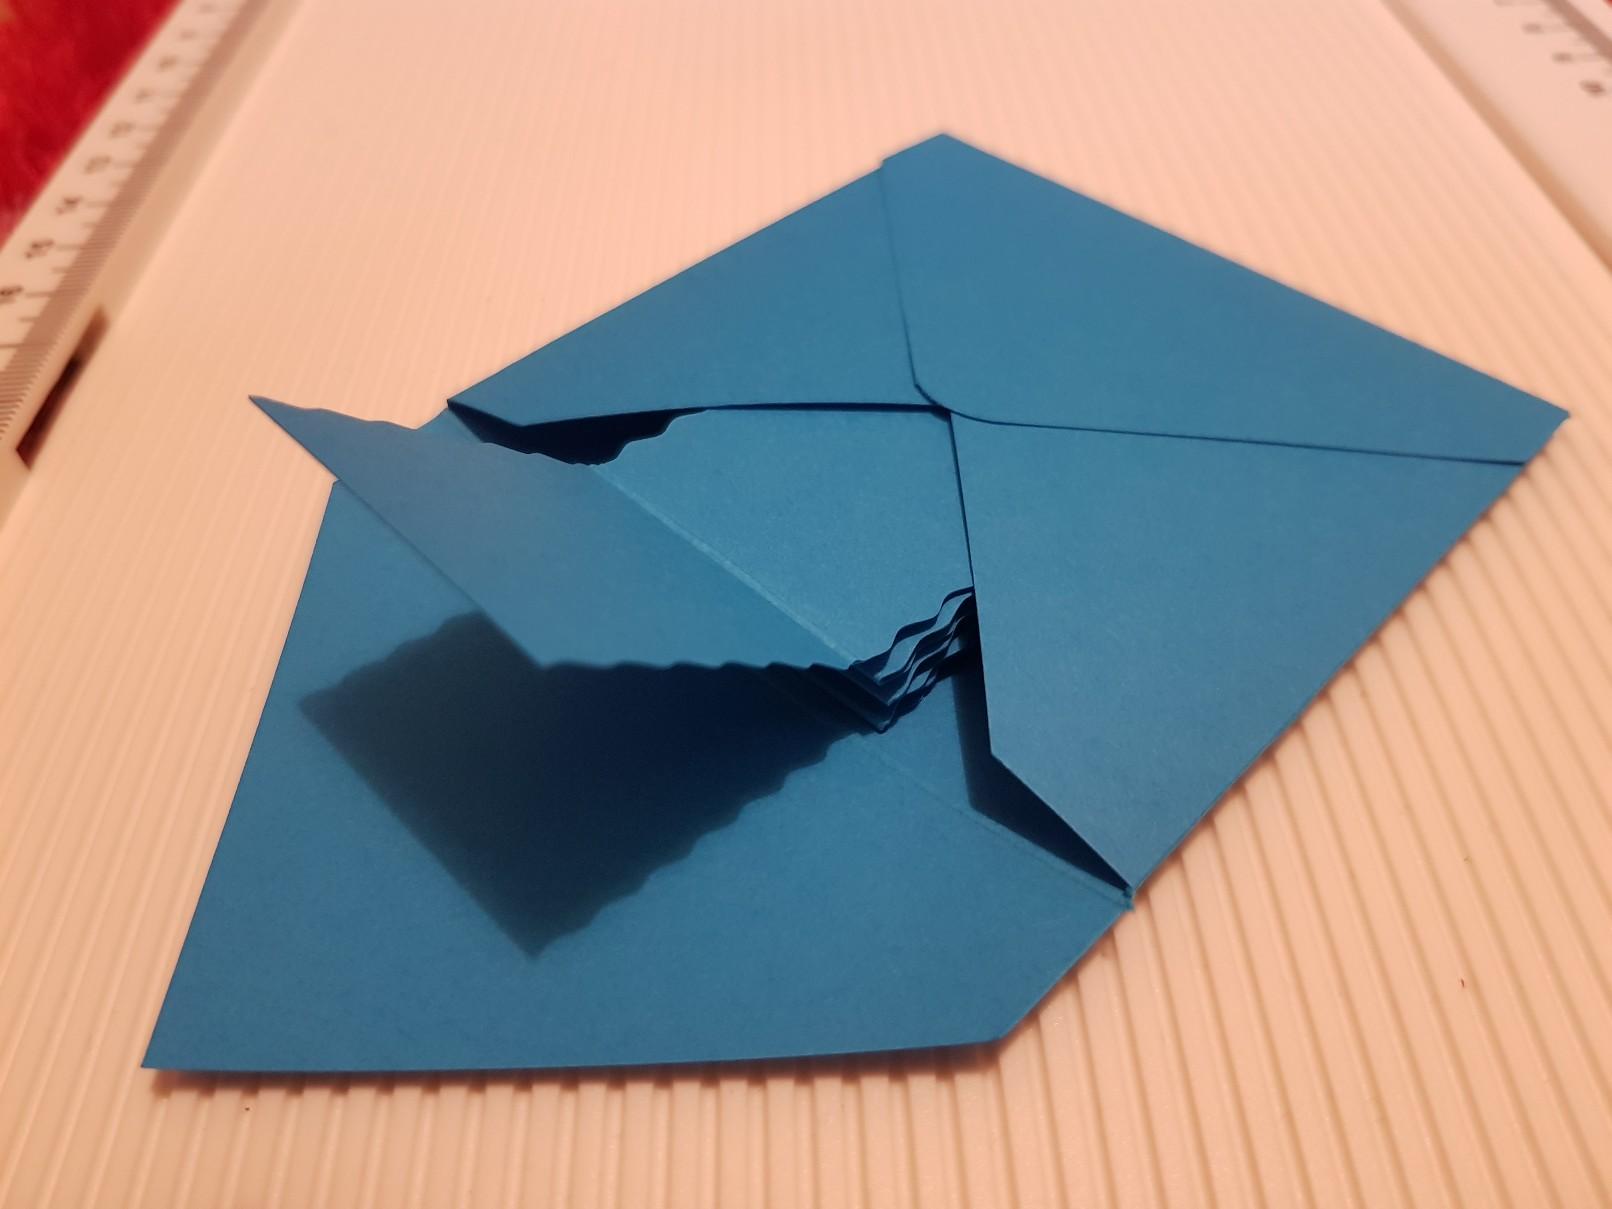 nemo birthday invitation envelope creased